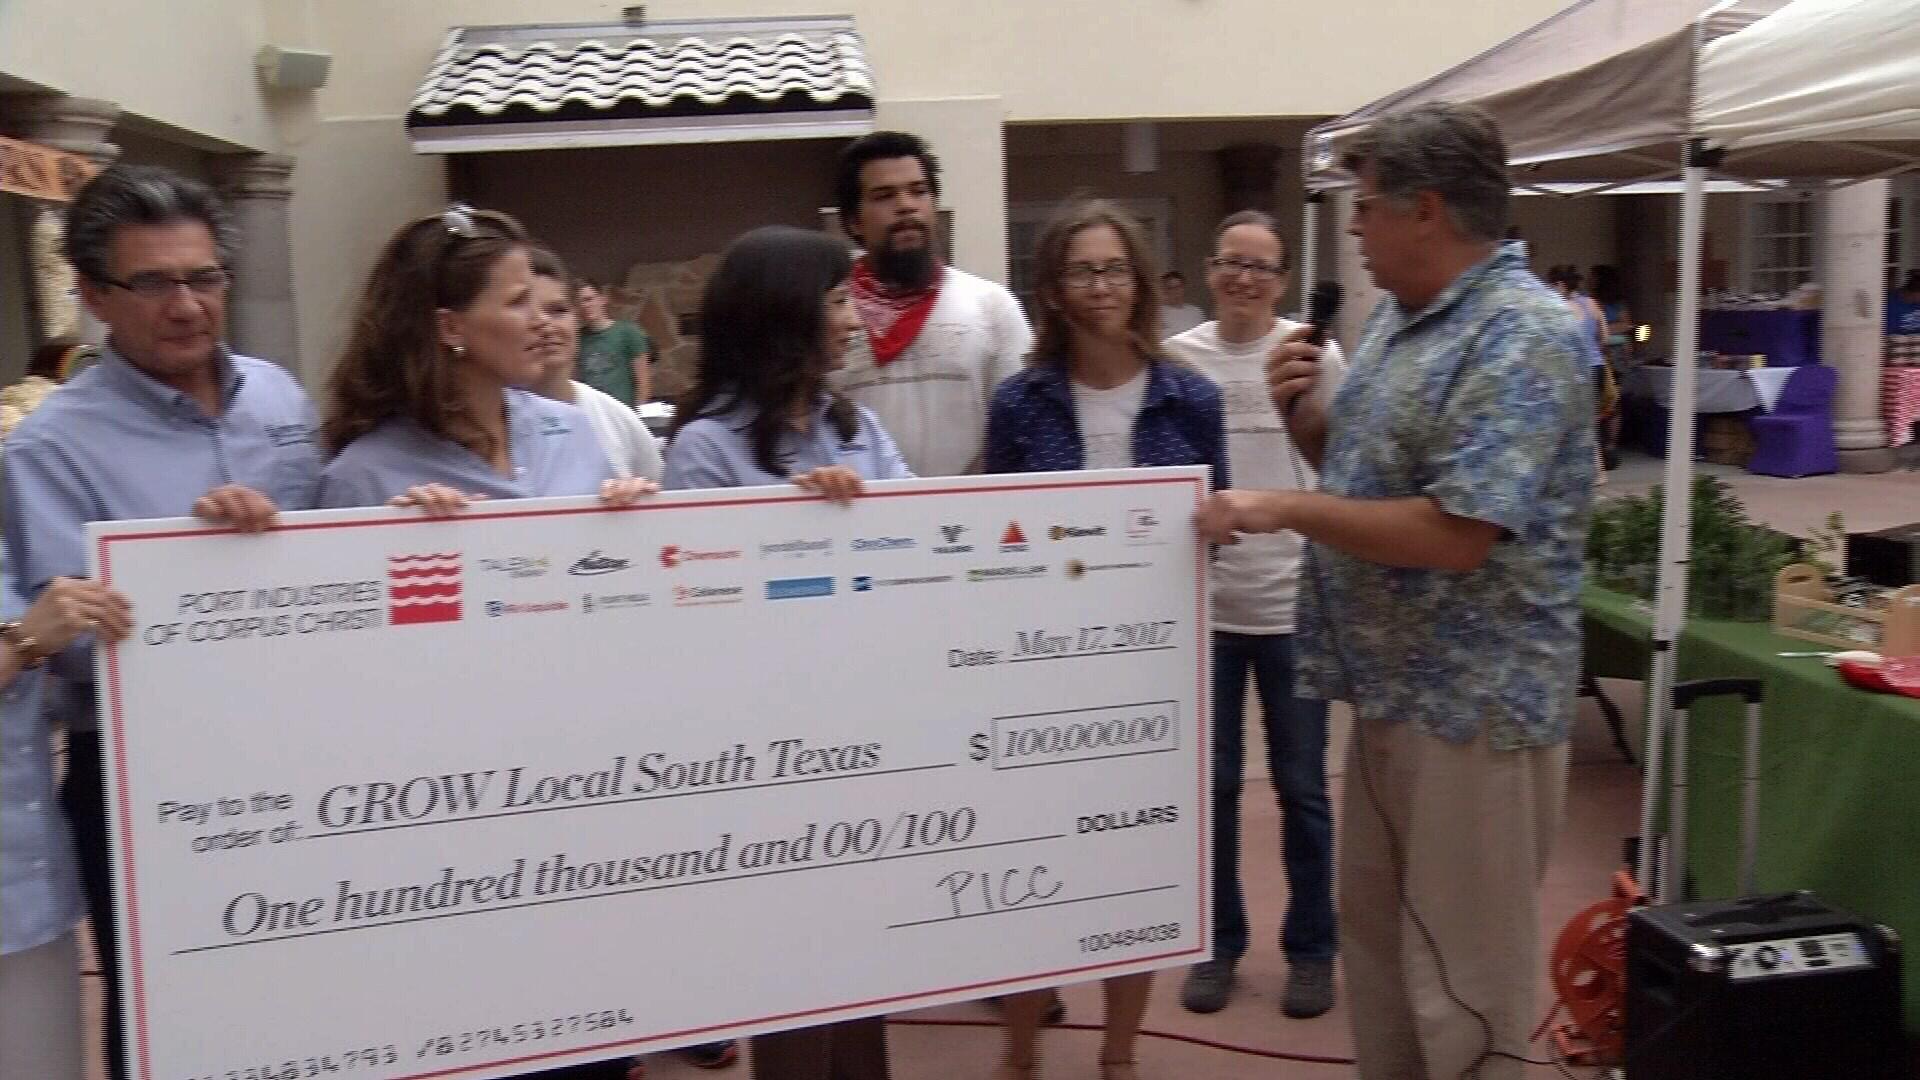 Port Industries Executive Director Bob Paulison presents a $100,000 check to Grow Local South Texas. (KRIS)